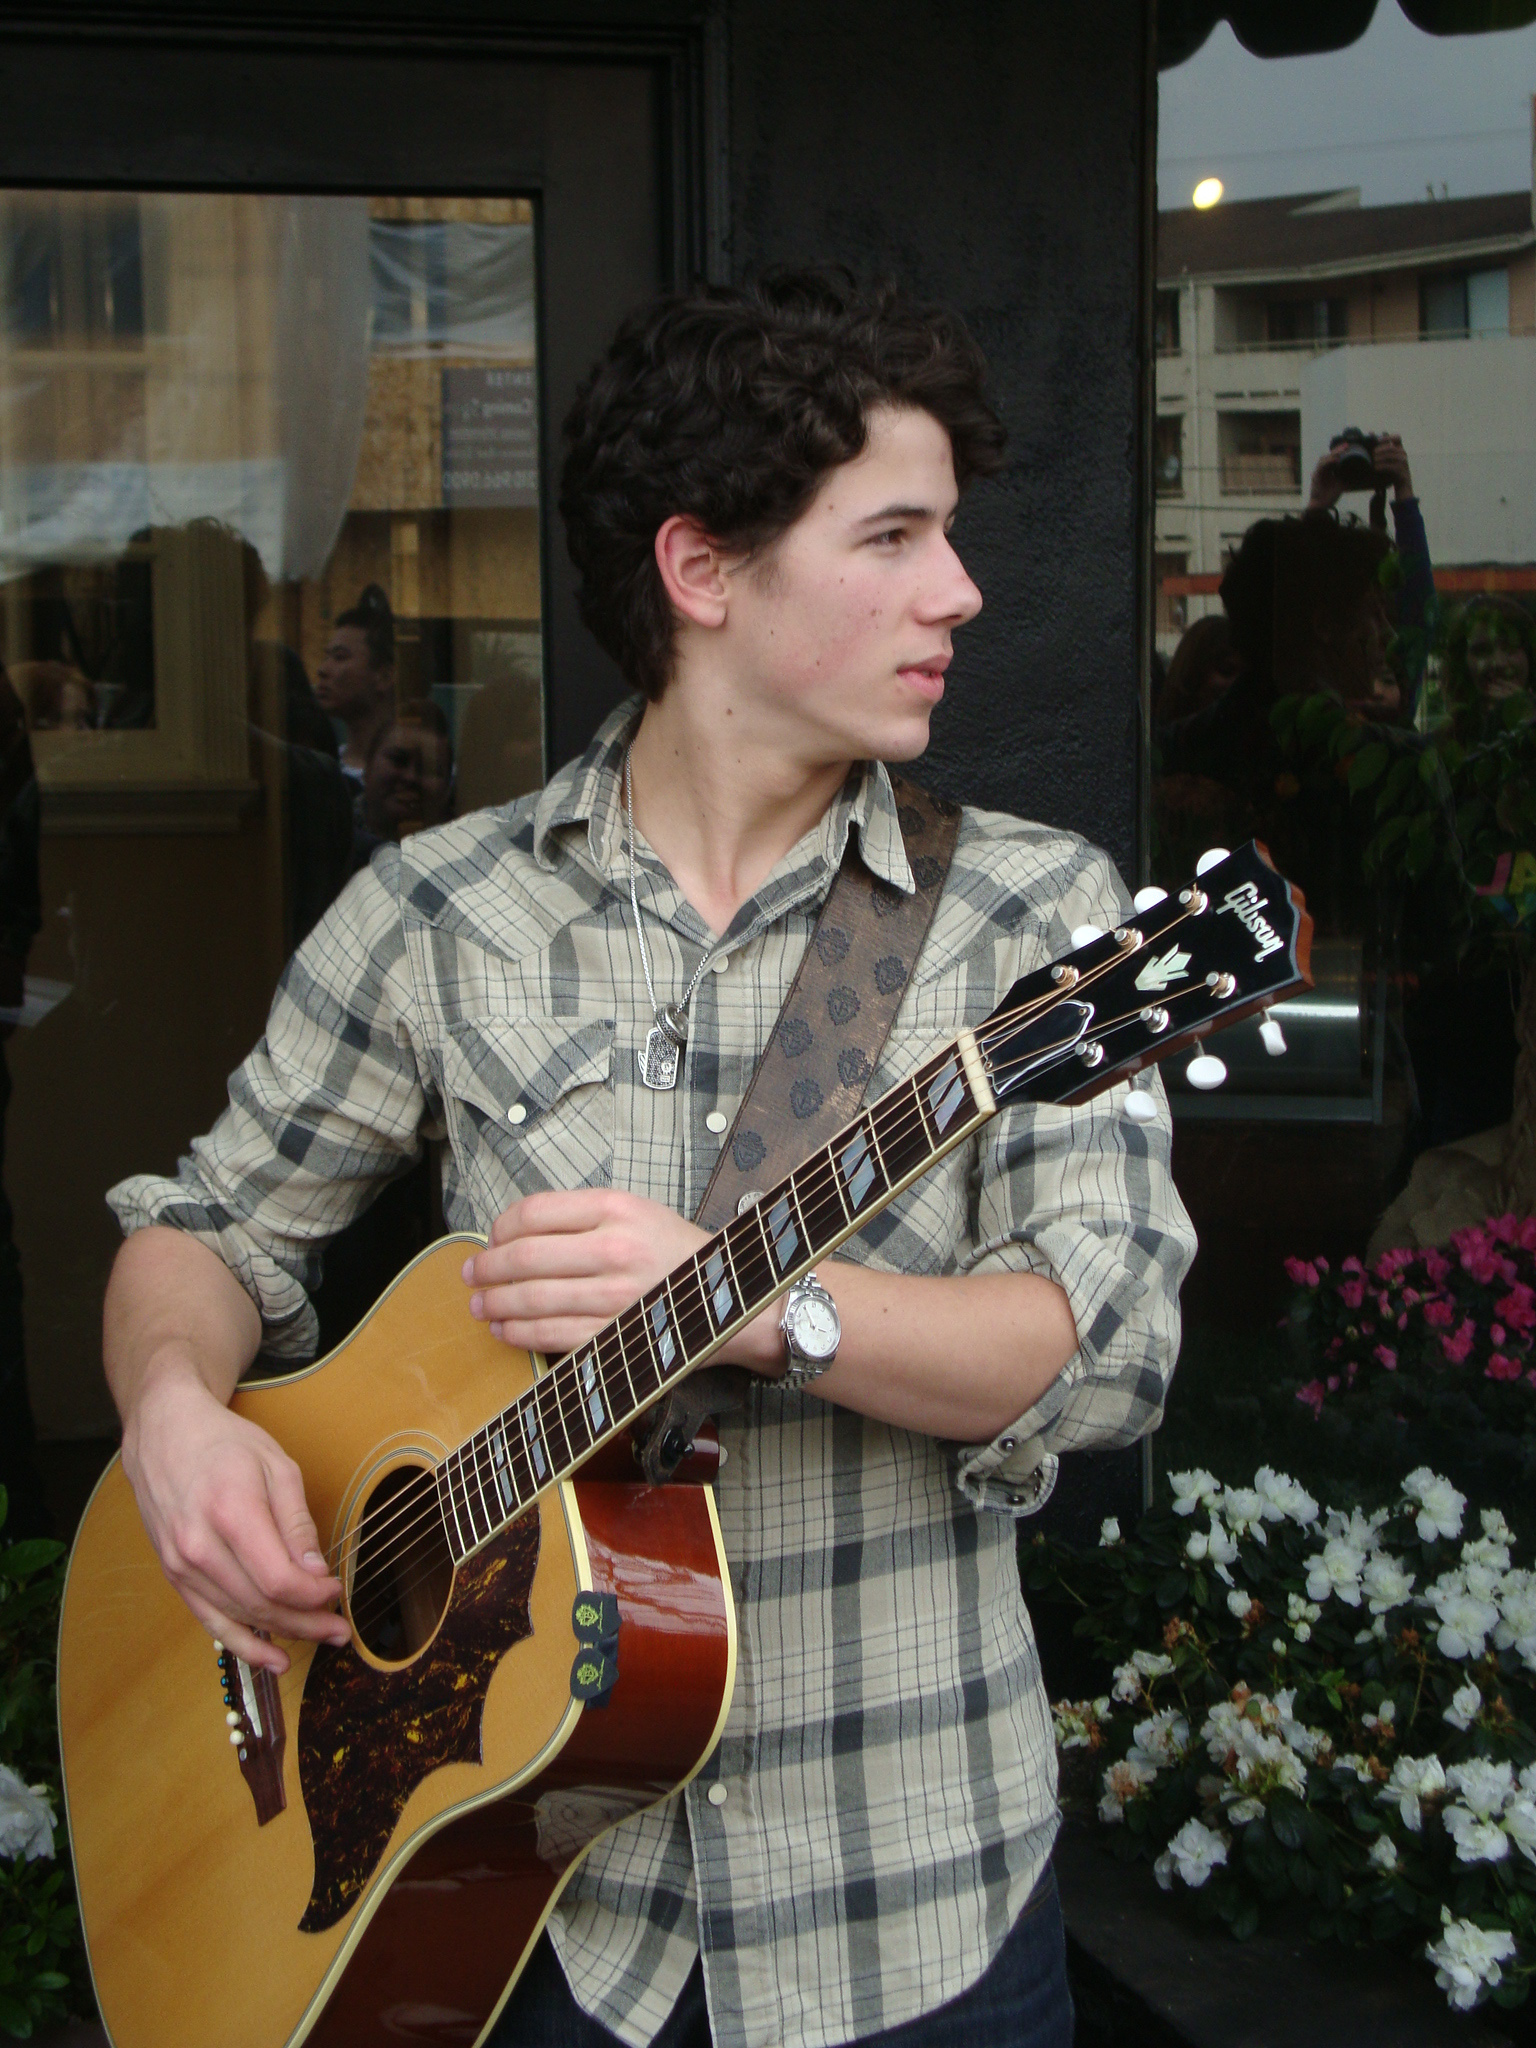 Nick Jonas Feb. 2nd 2010